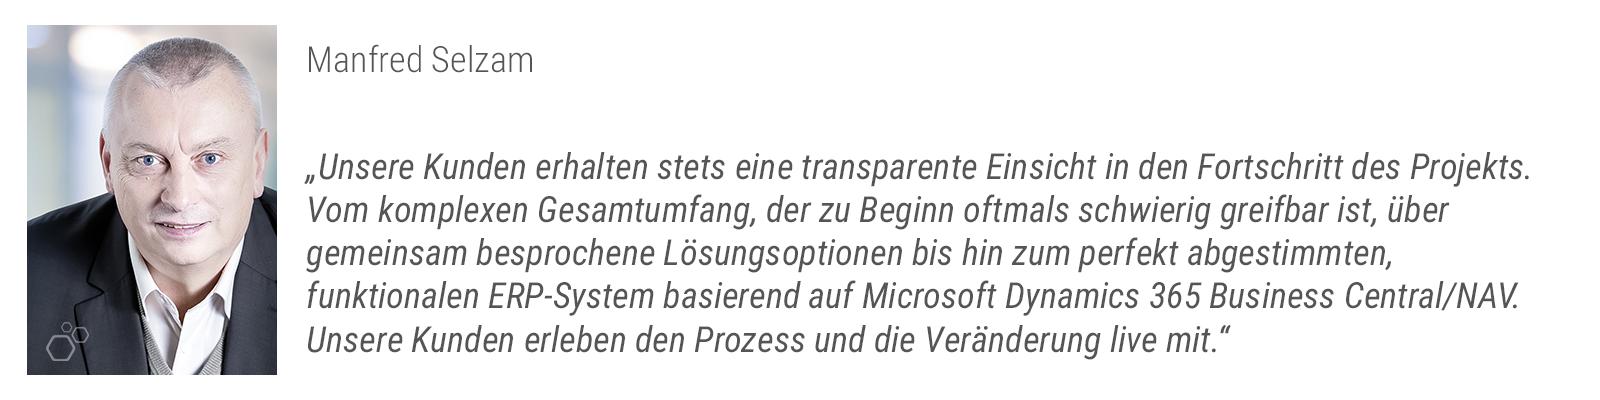 Projektmanagement - Manfred Selzam